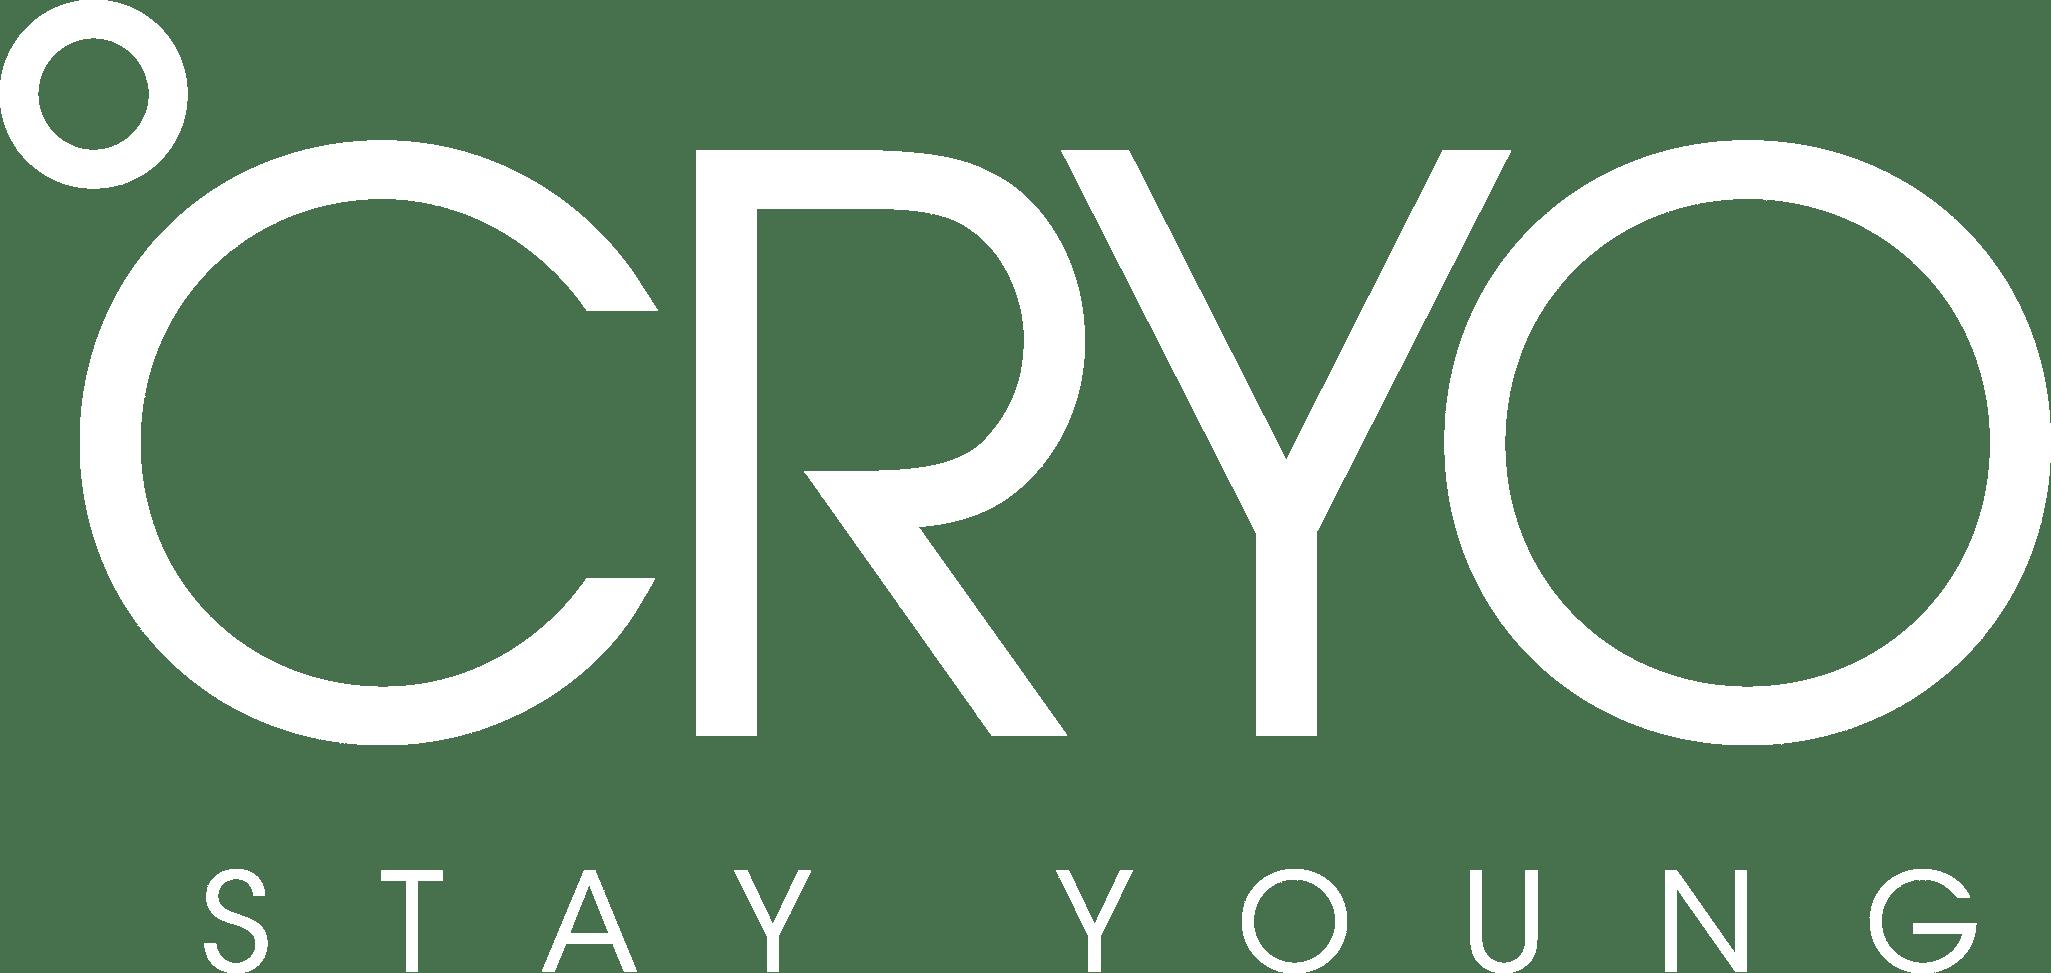 CRYO Logo white font